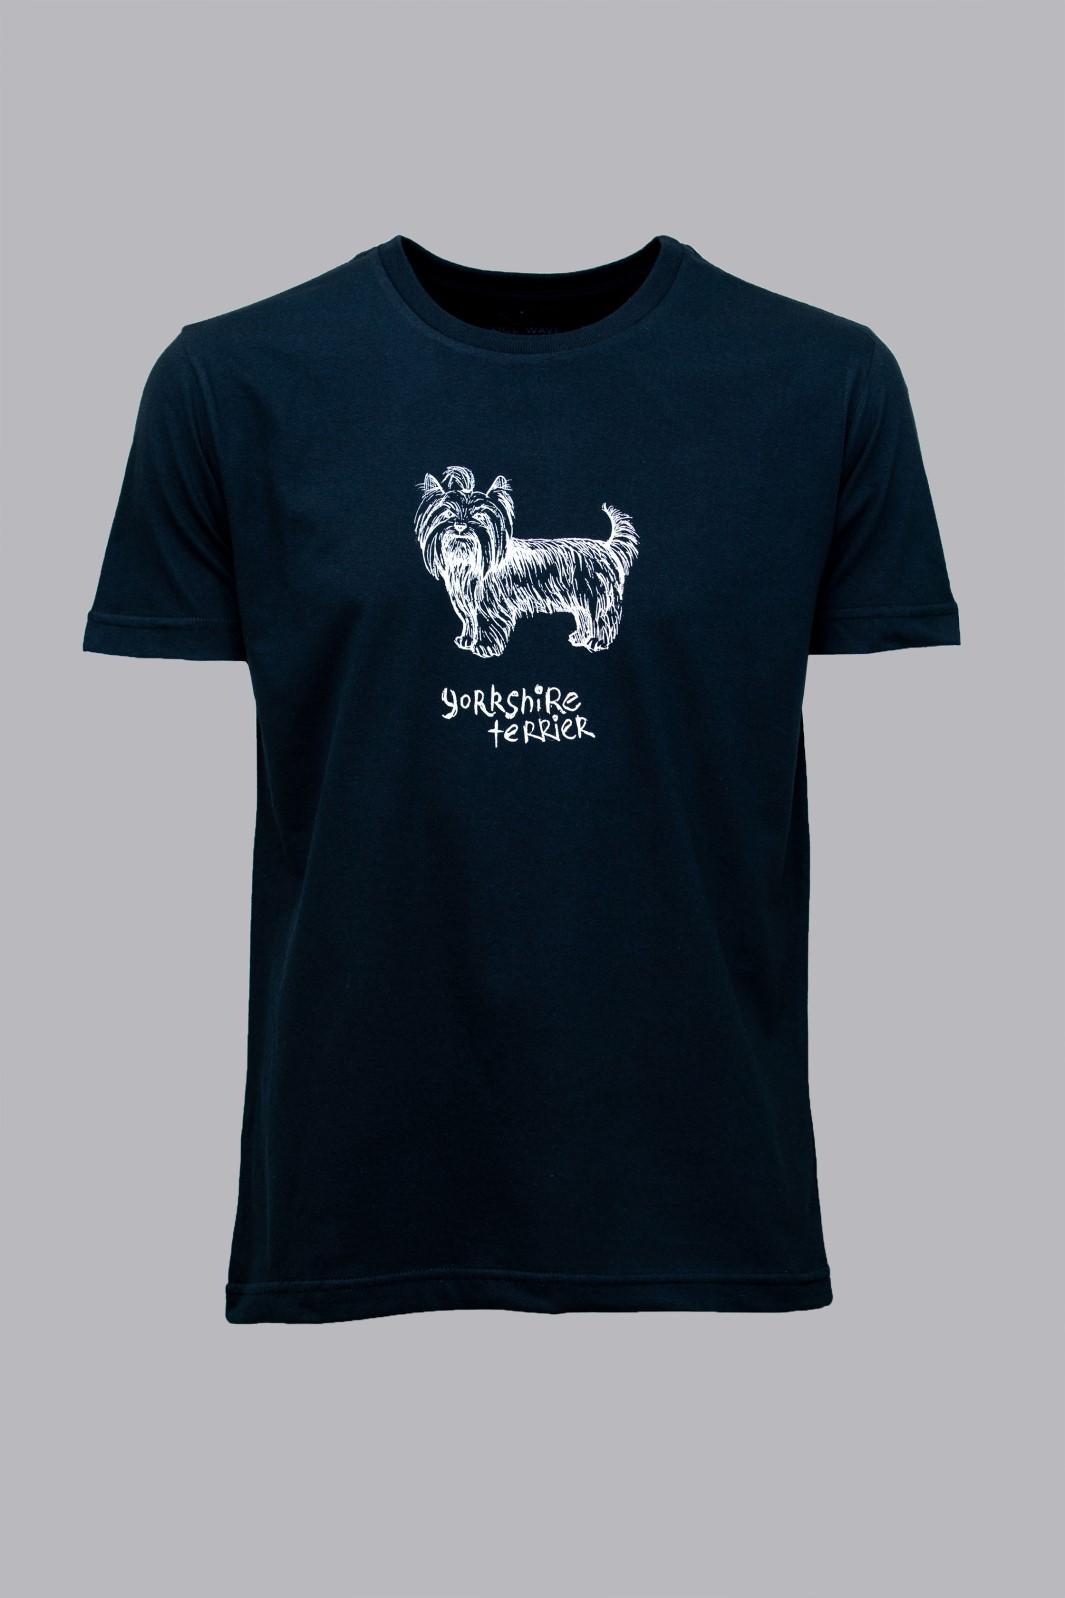 Camiseta CoolWave Yorkshire Terrier